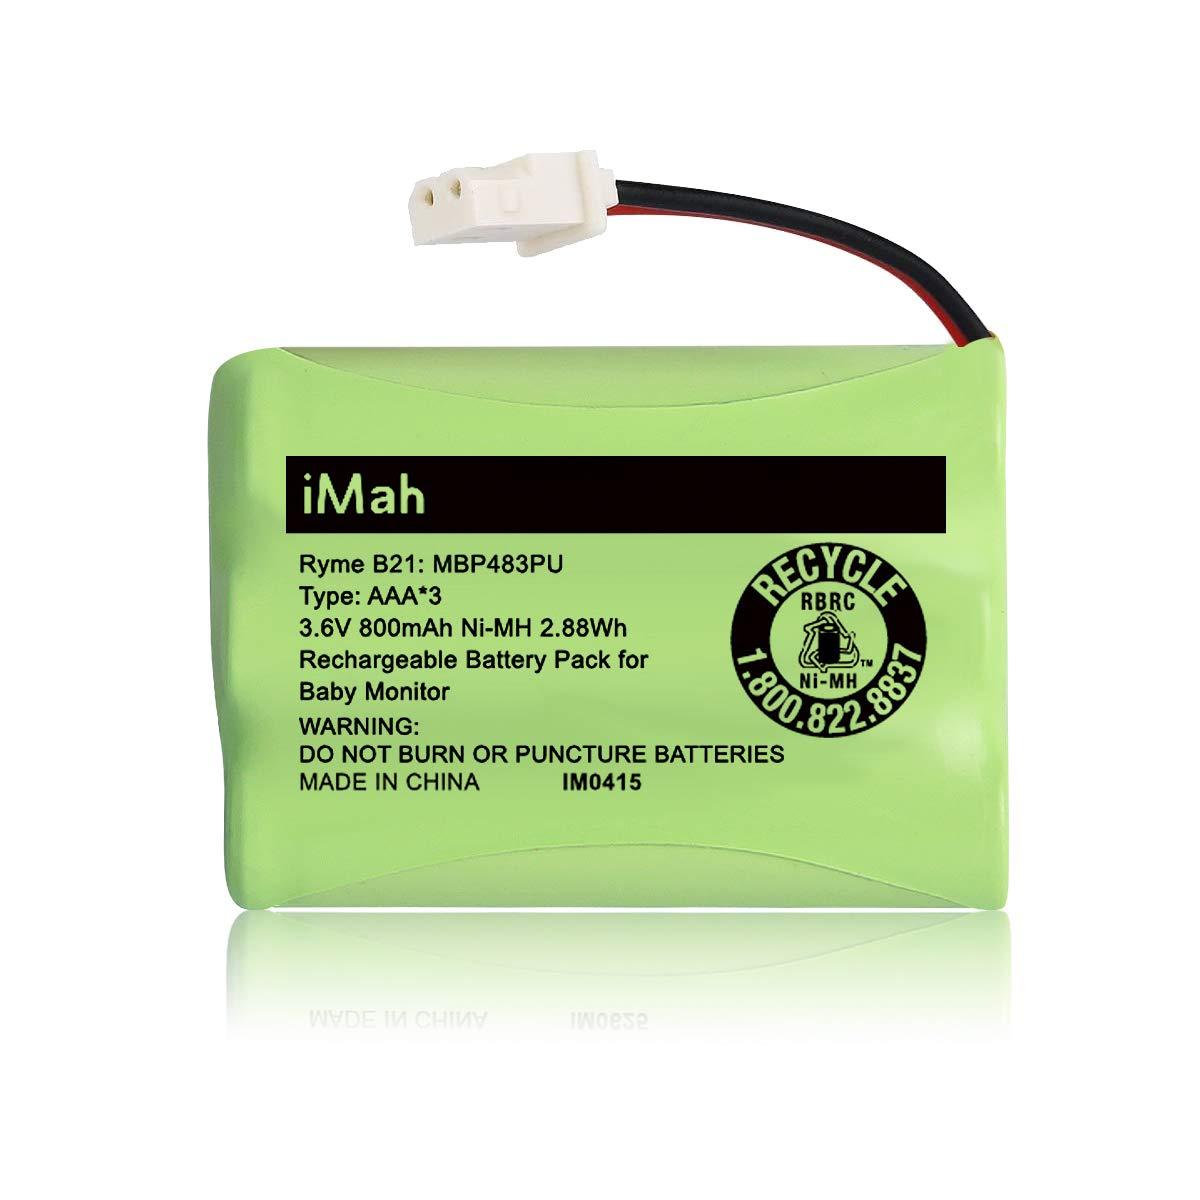 iMah Ryme B21 Battery Compatible with Motorola Baby Monitor MBP33XL (only fits MBP33S MBP36 MBP36S newer 800mAh version) MBP481 MBP482 MBP483 (Don't fit MBP33 MBP33S MBP36 MBP36S older 900mAh version)